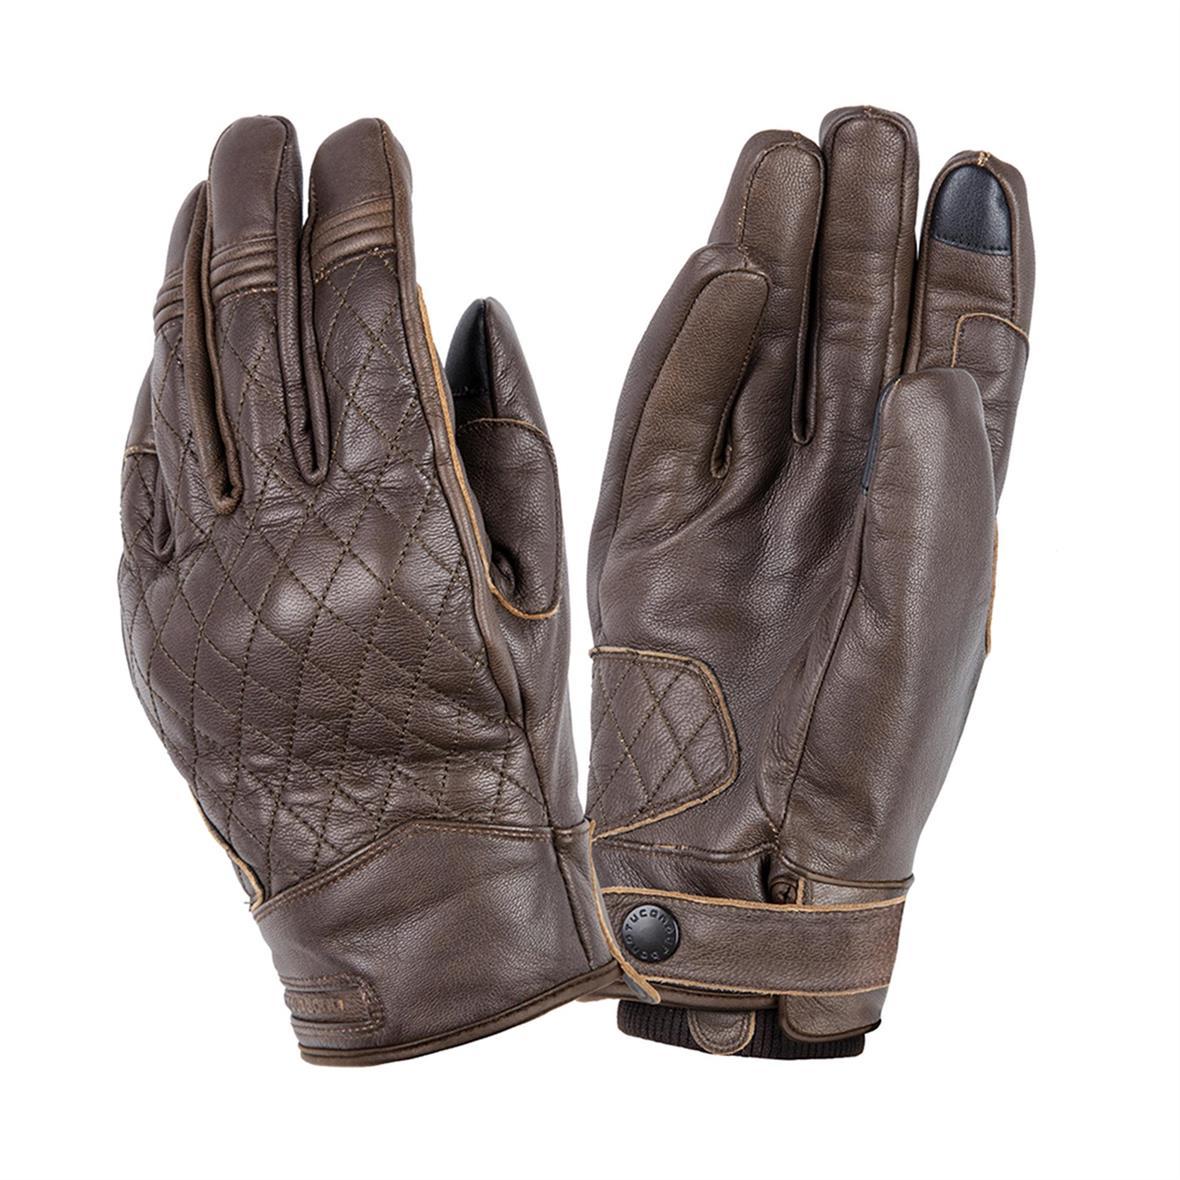 Product Image for 'Gloves TUCANO URBANO STEVE size STitle'